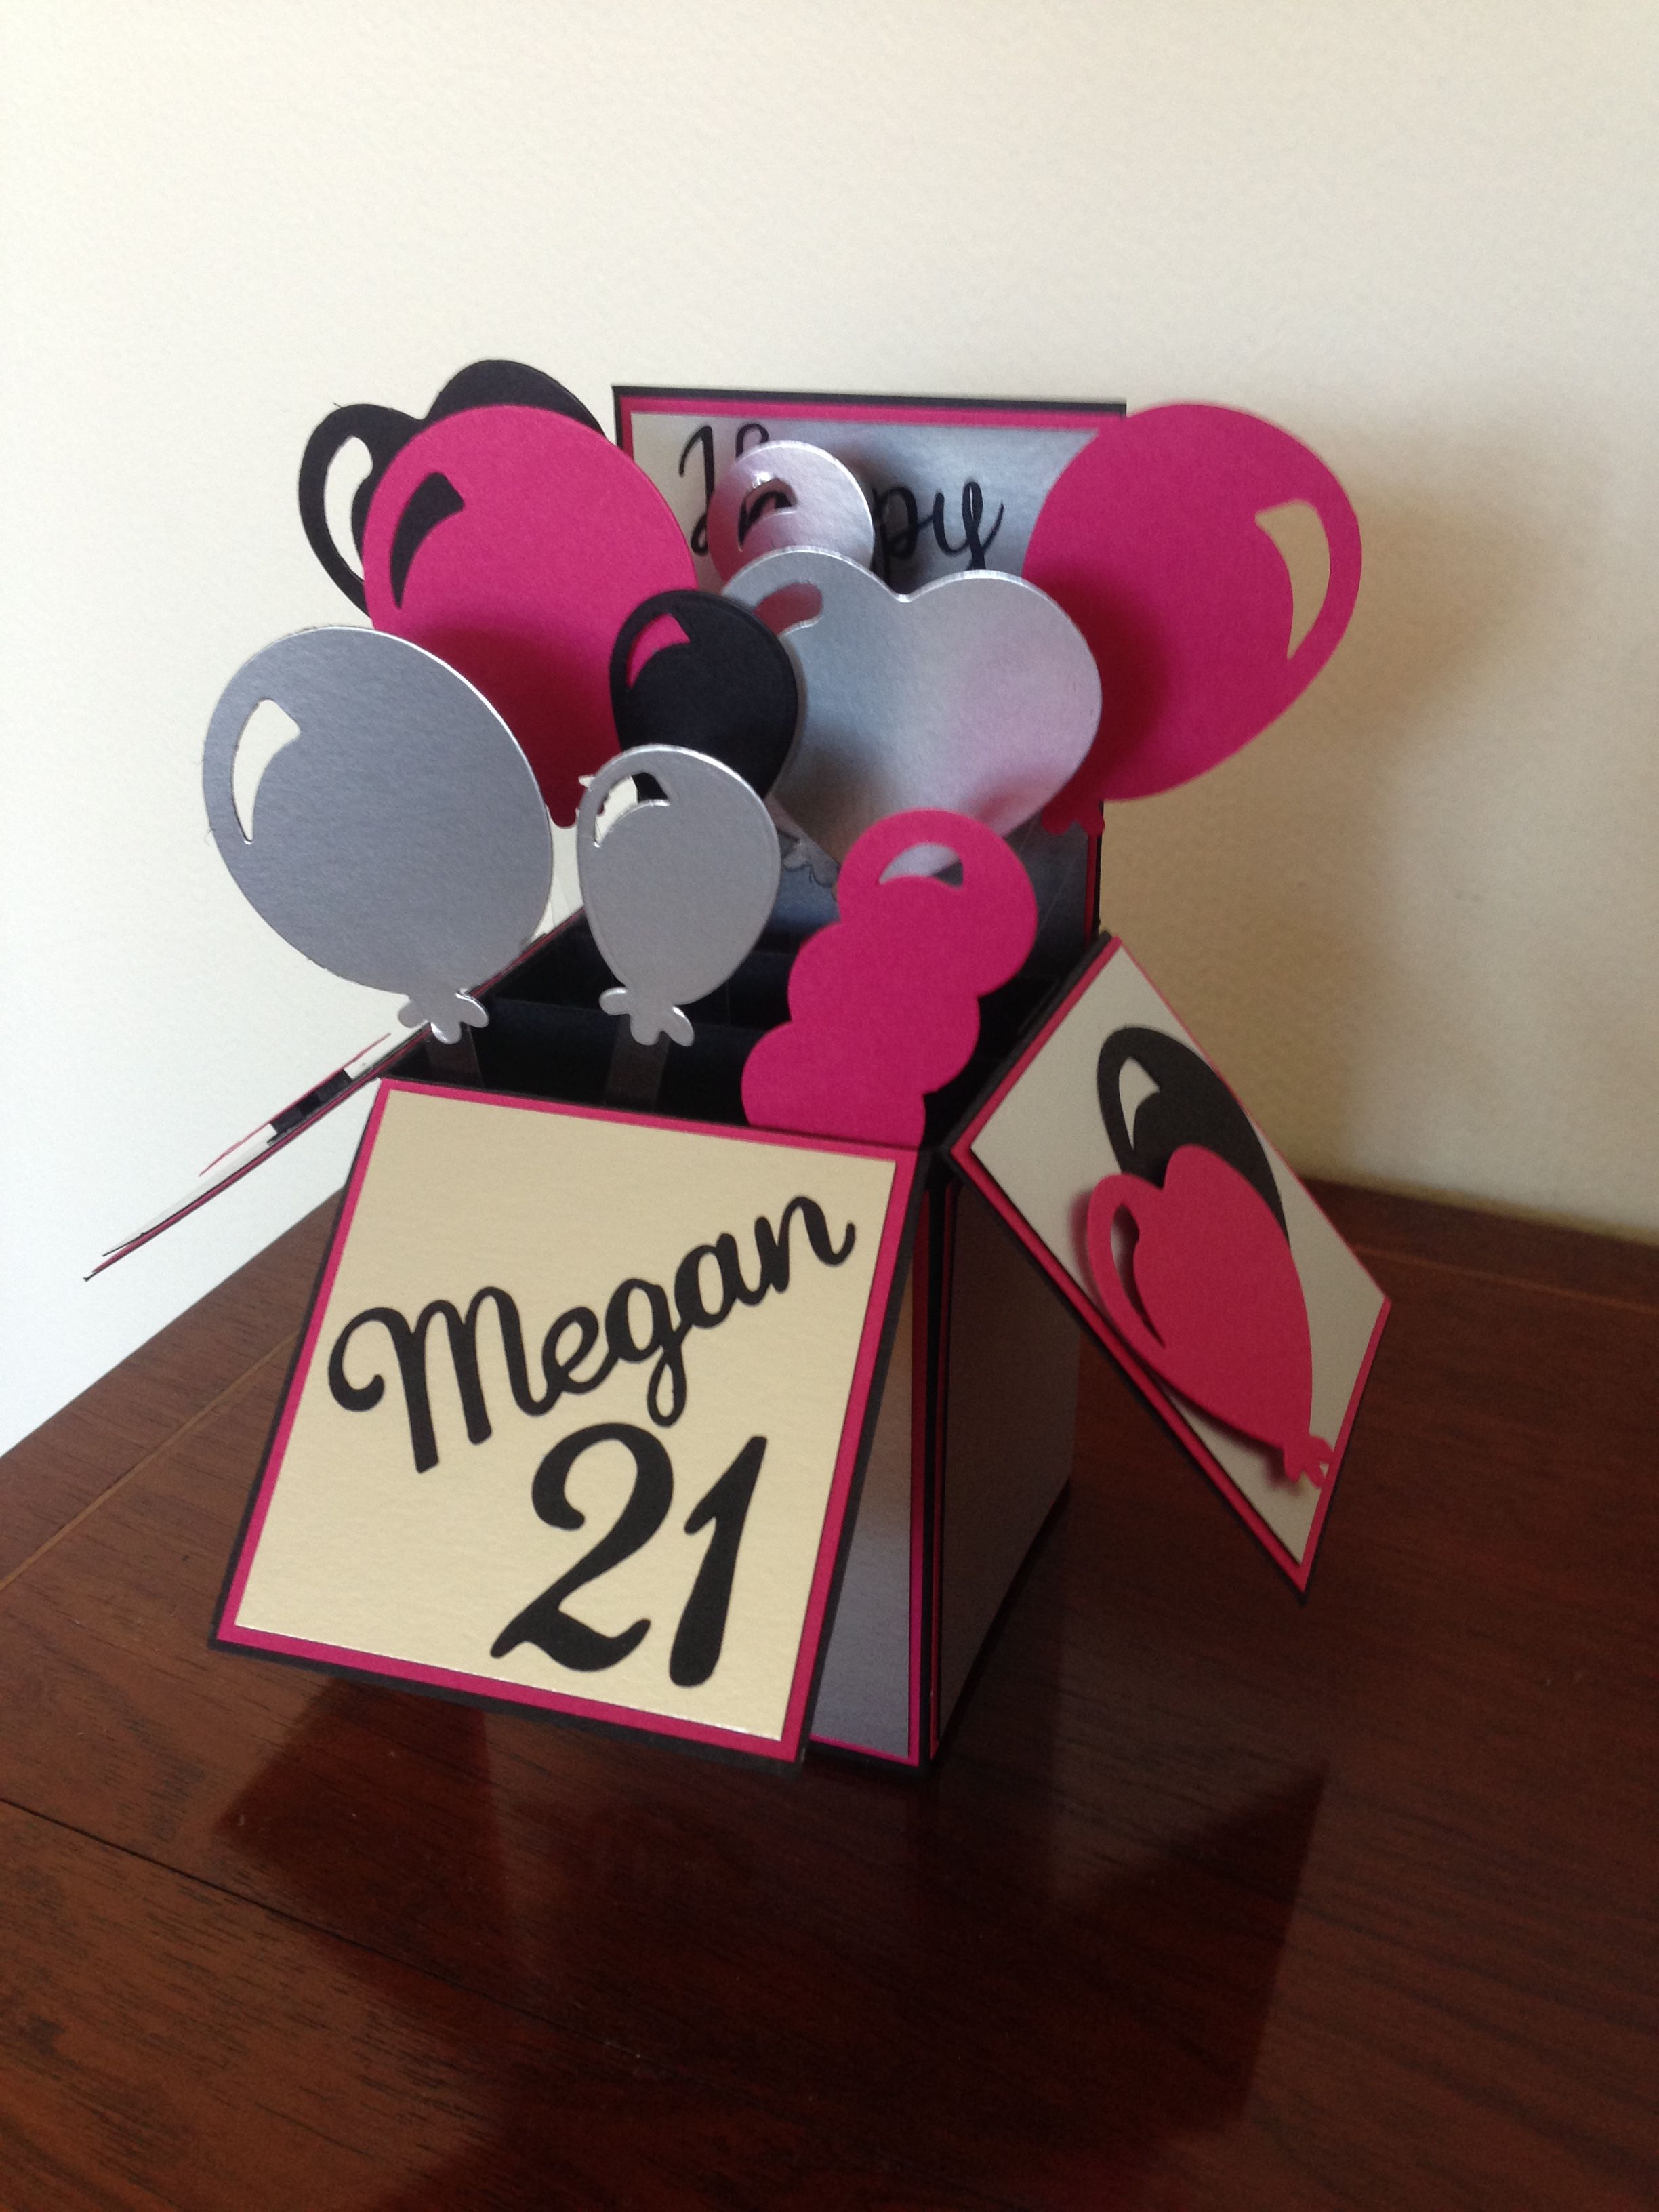 Pin By Robyn Woolliams On Card Ideas 21st Birthday Cards Fancy Fold Cards Birthday Cards